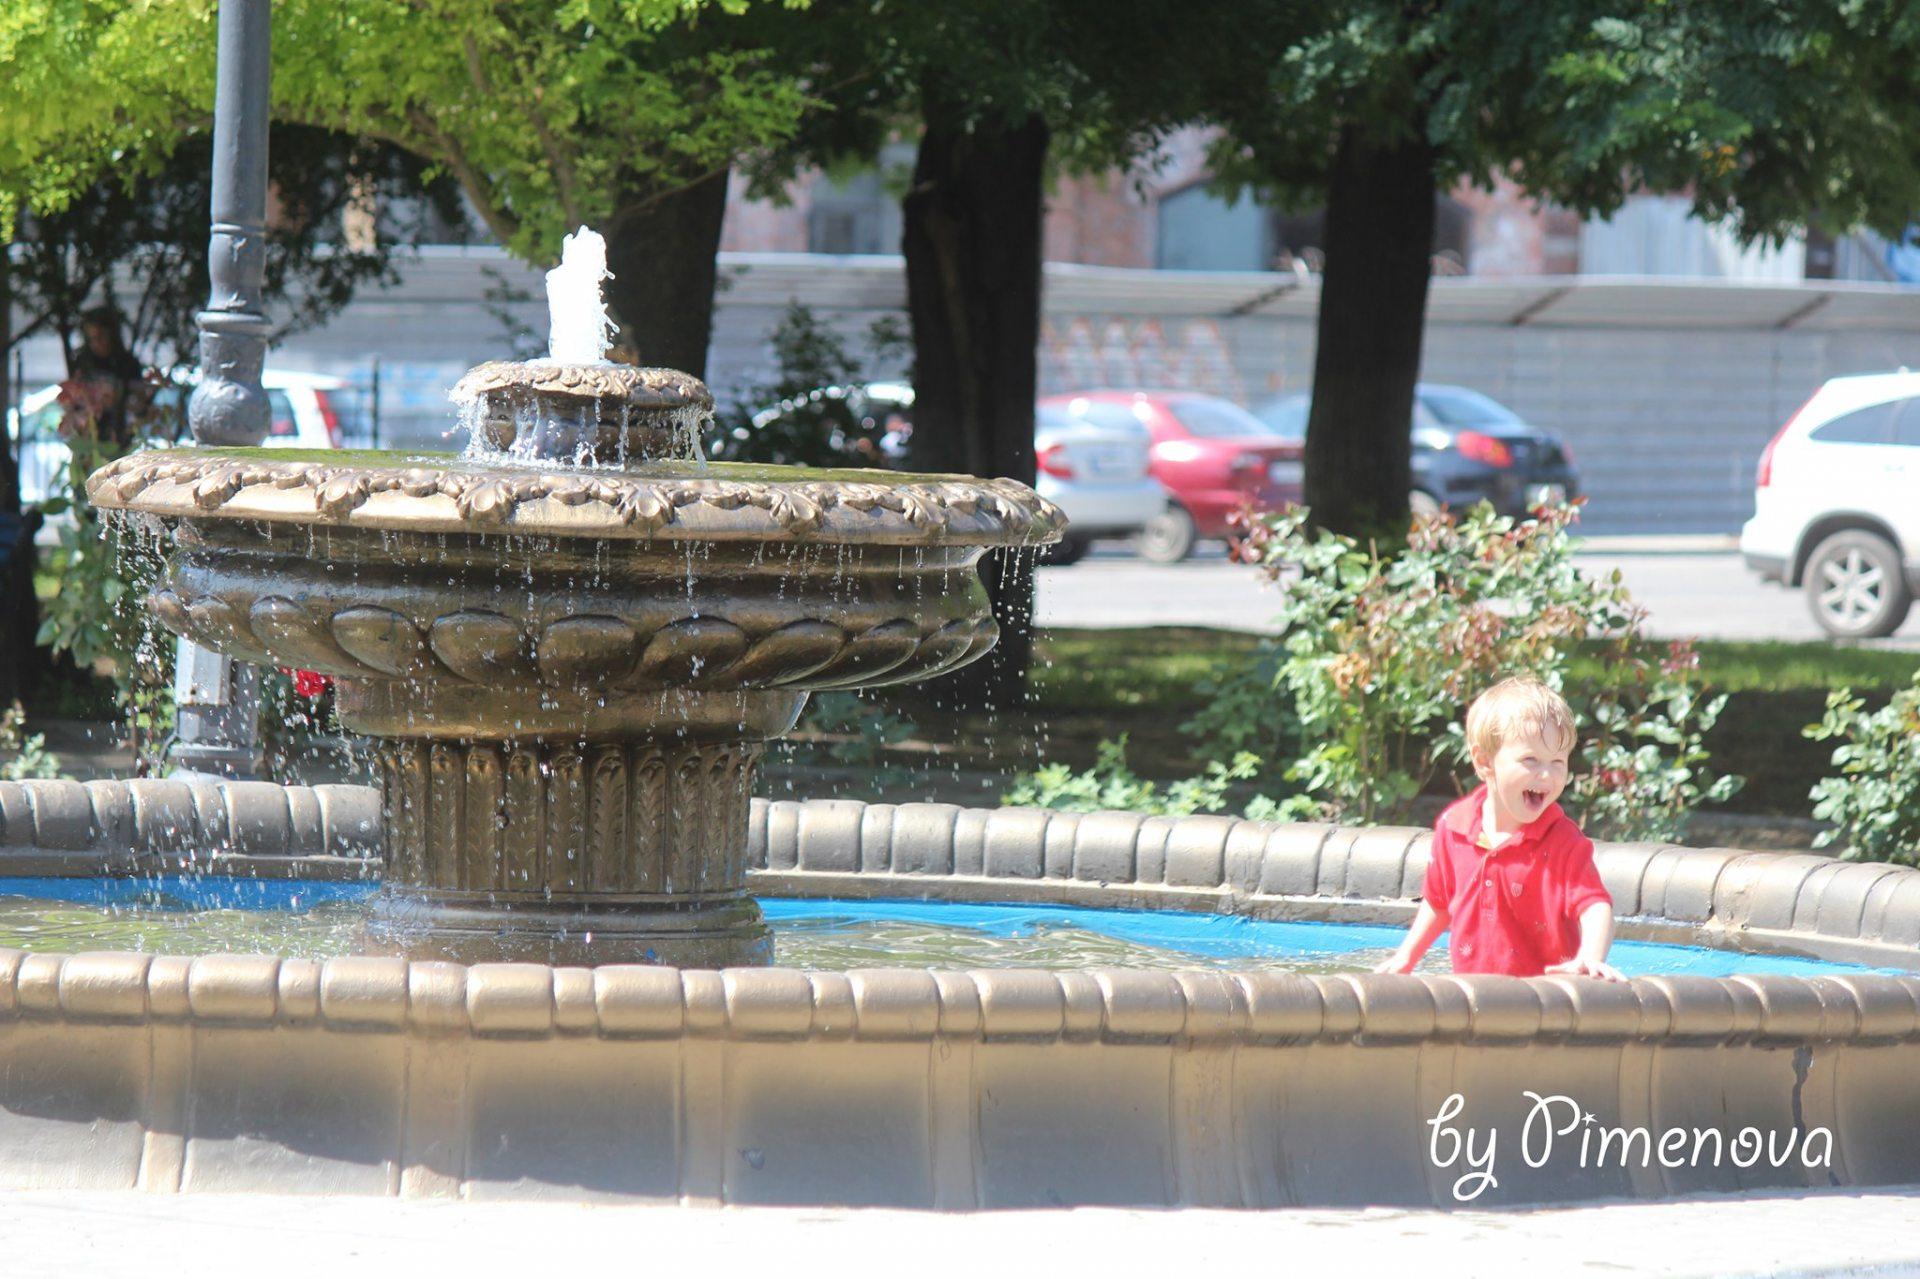 Херсон, фонтан, Пименова